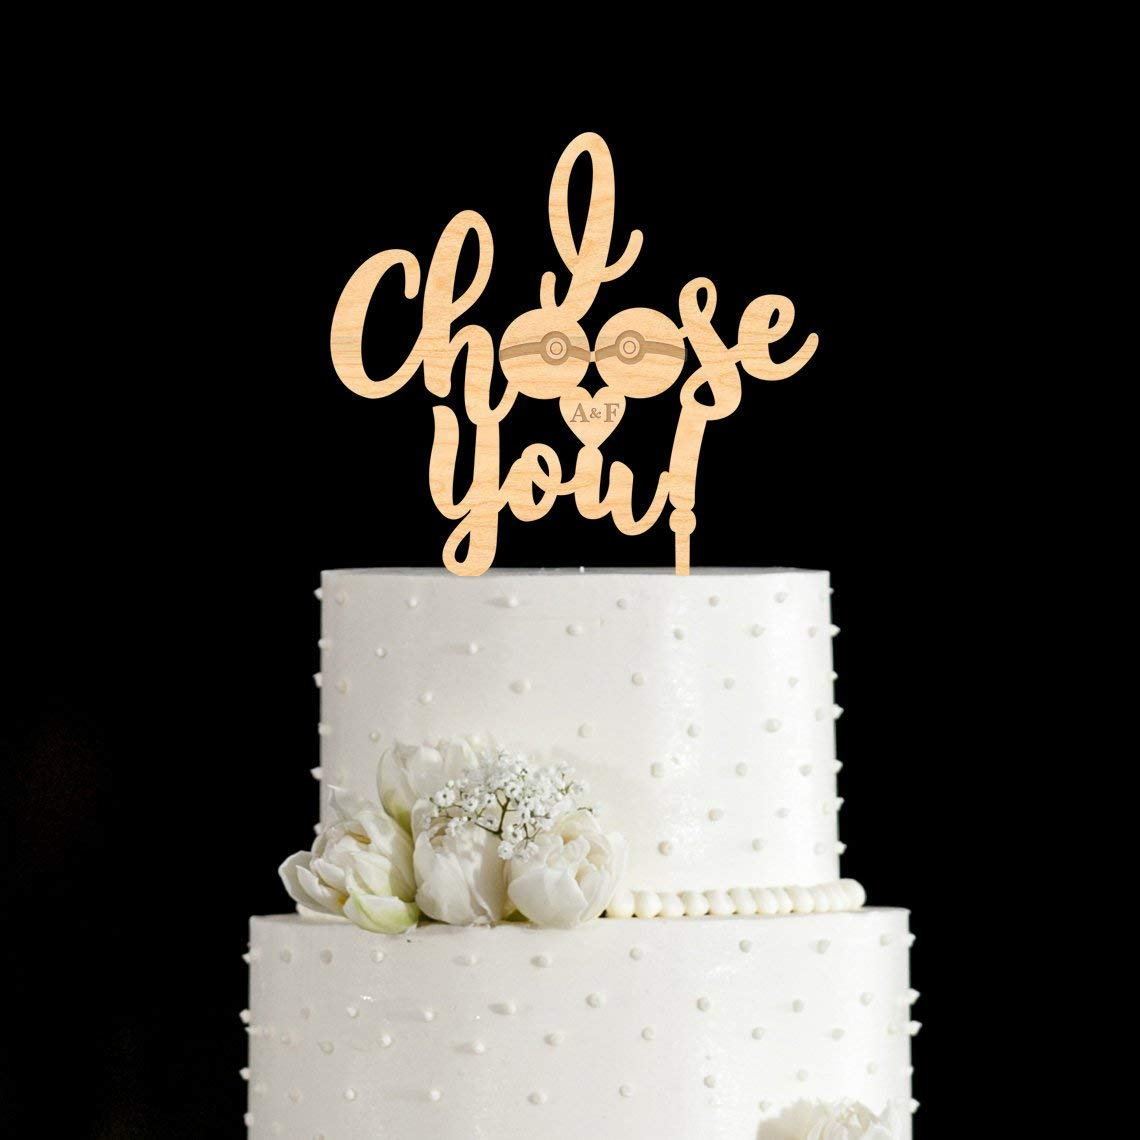 Wedding Cake Topper Pokemon Design Amazon Com Grocery